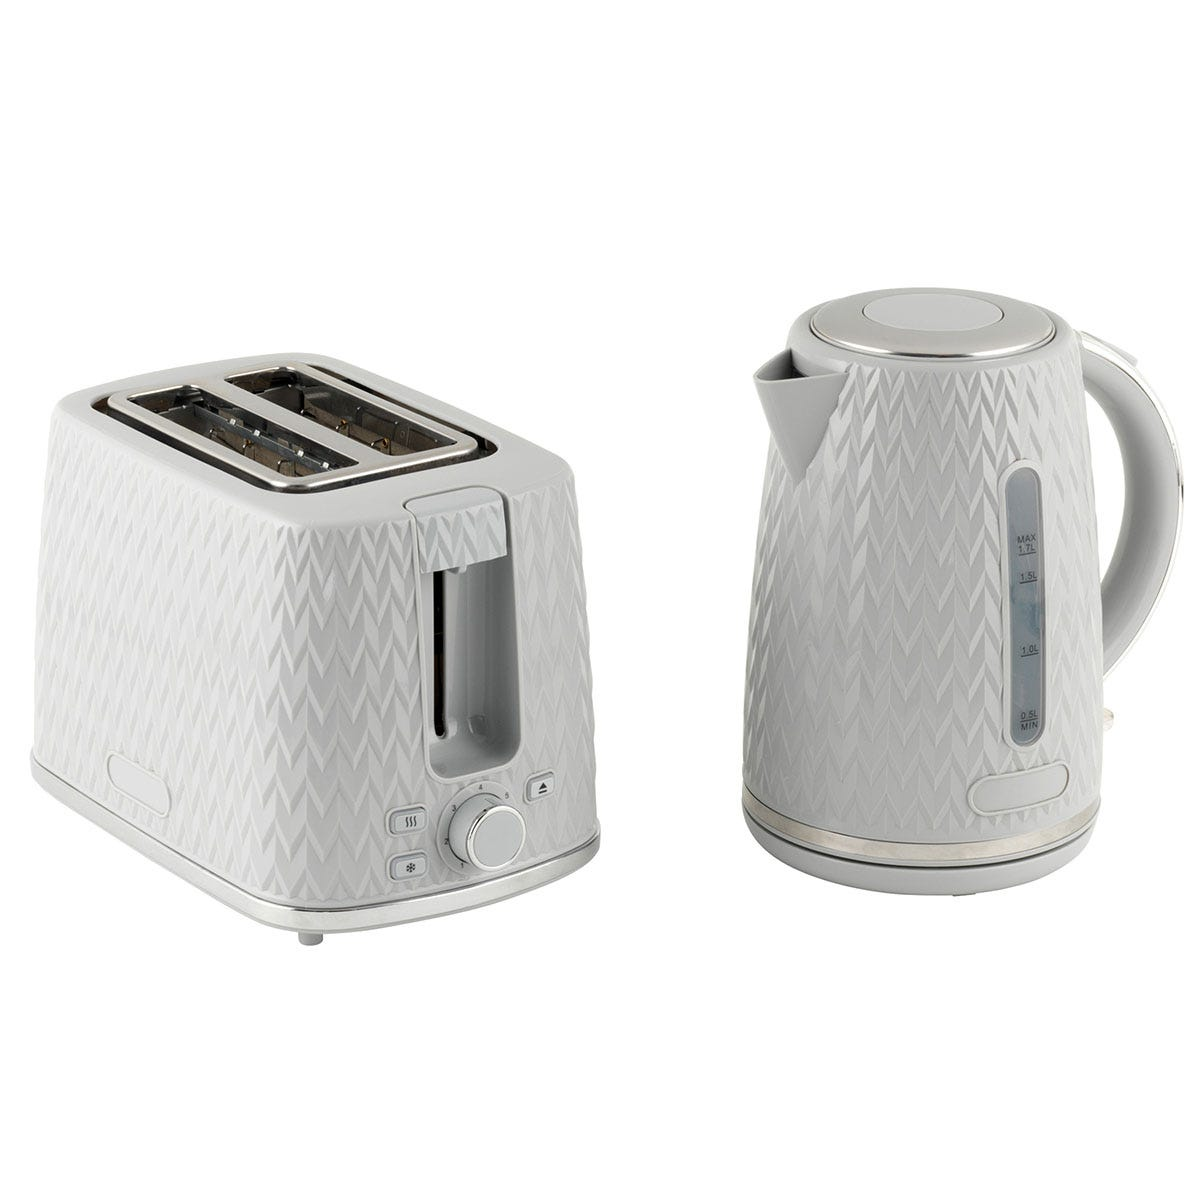 Progress COMBO-5627 Chevron Kettle and 2 Slice Toaster Breakfast Appliance Set - Grey